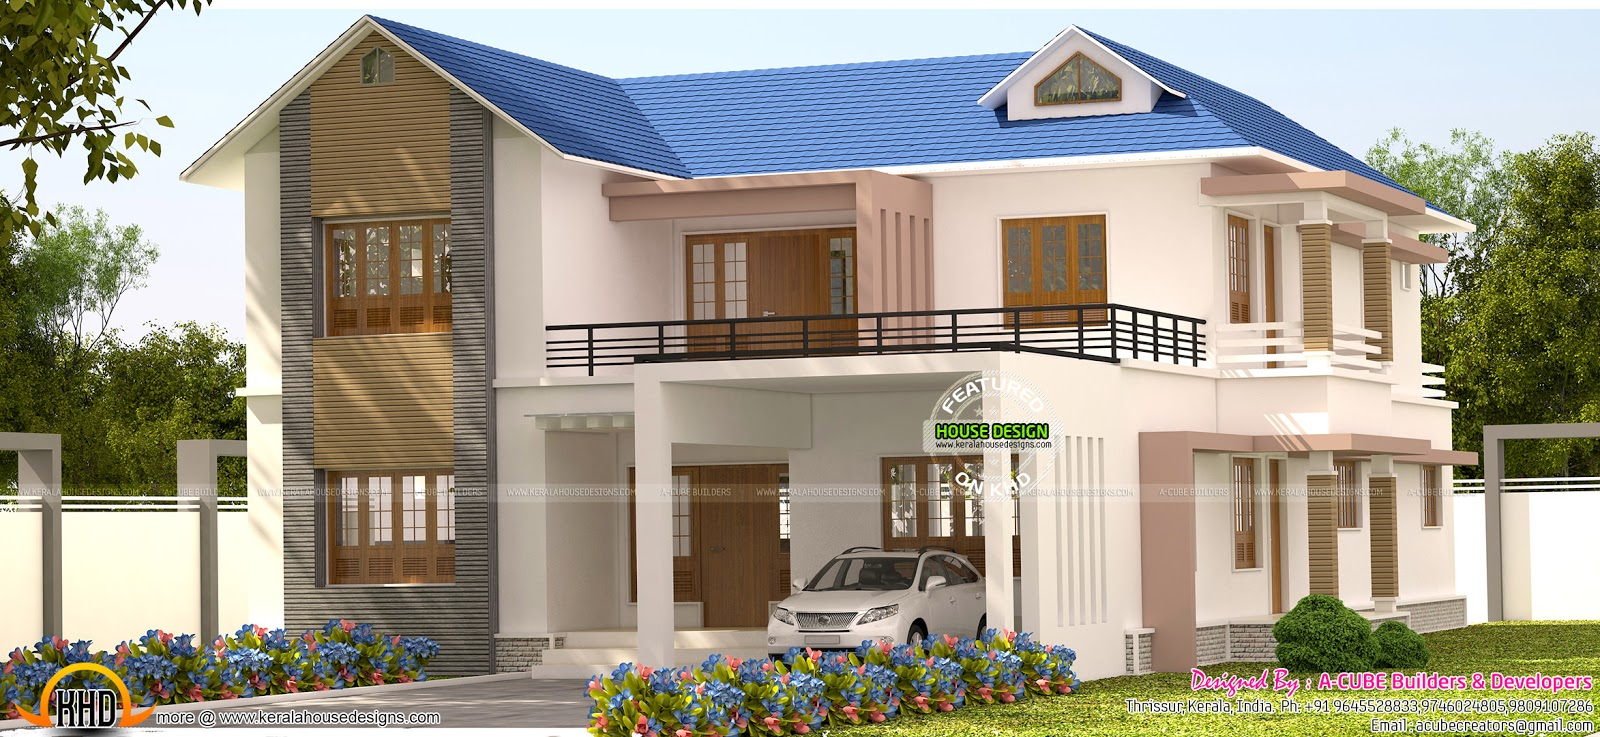 4 bhk kerala model house kerala home design and floor plans for 4 bhk house plans kerala